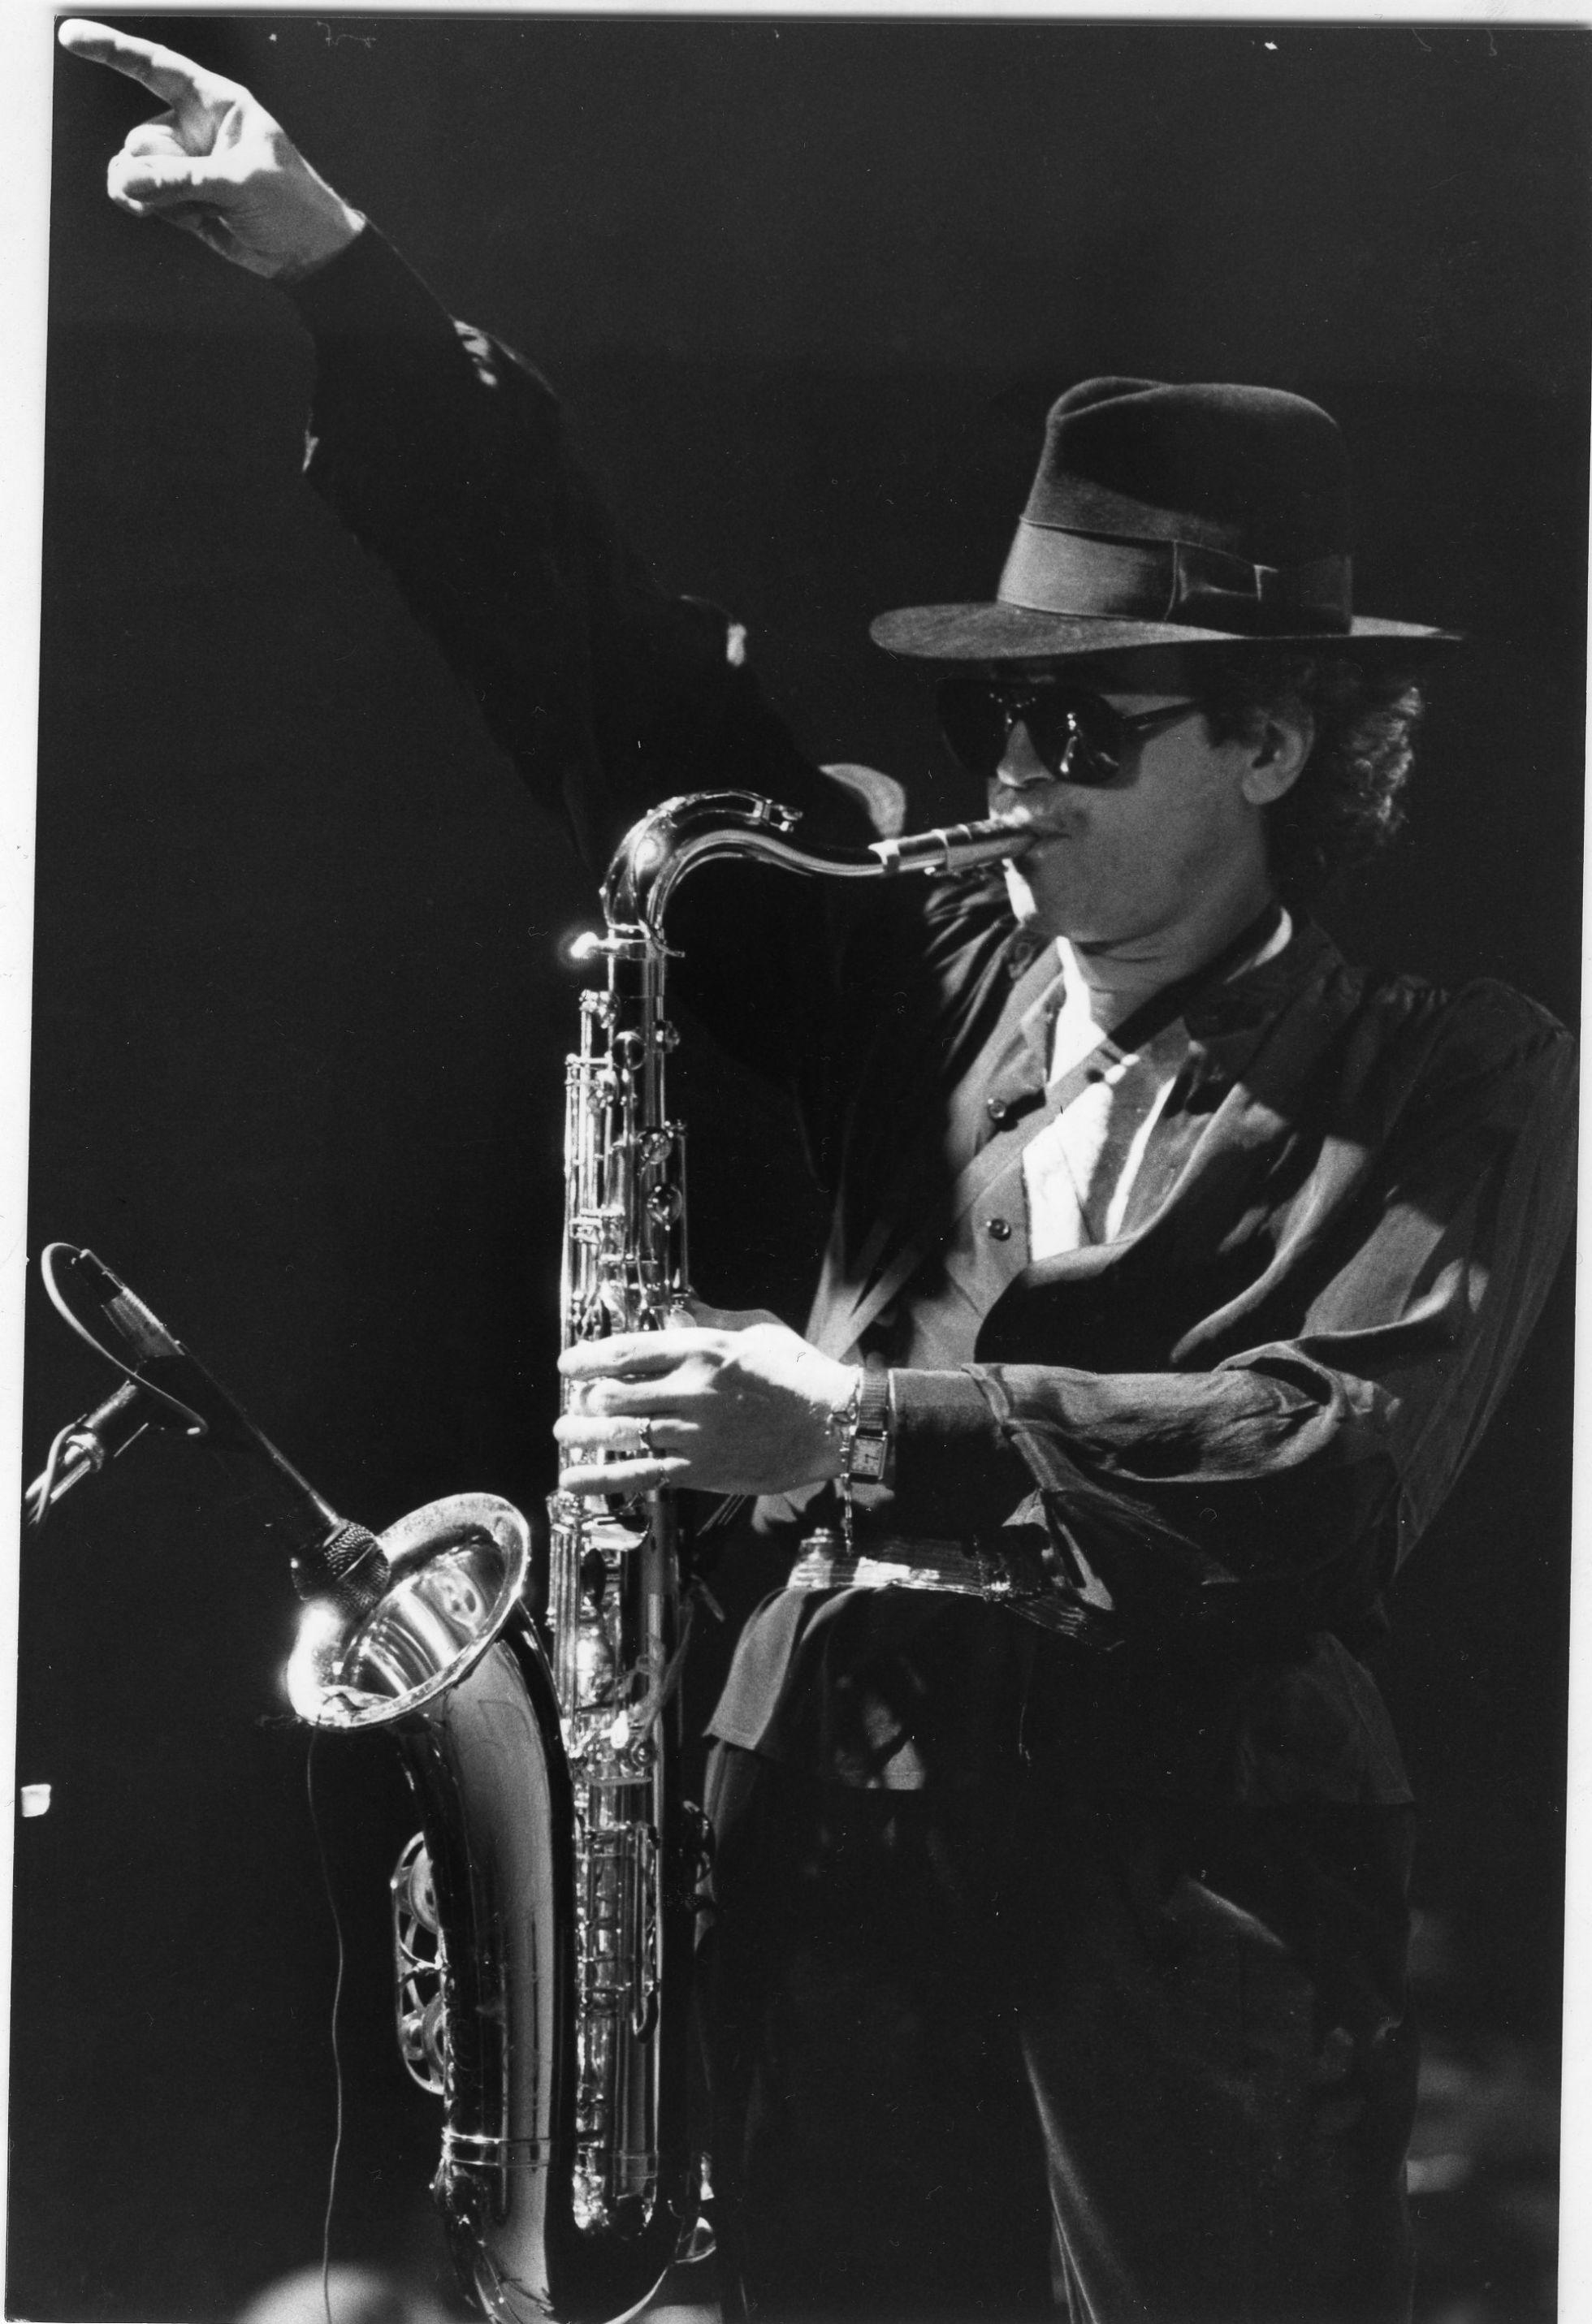 Gato Barbieri in a live performance in 1984